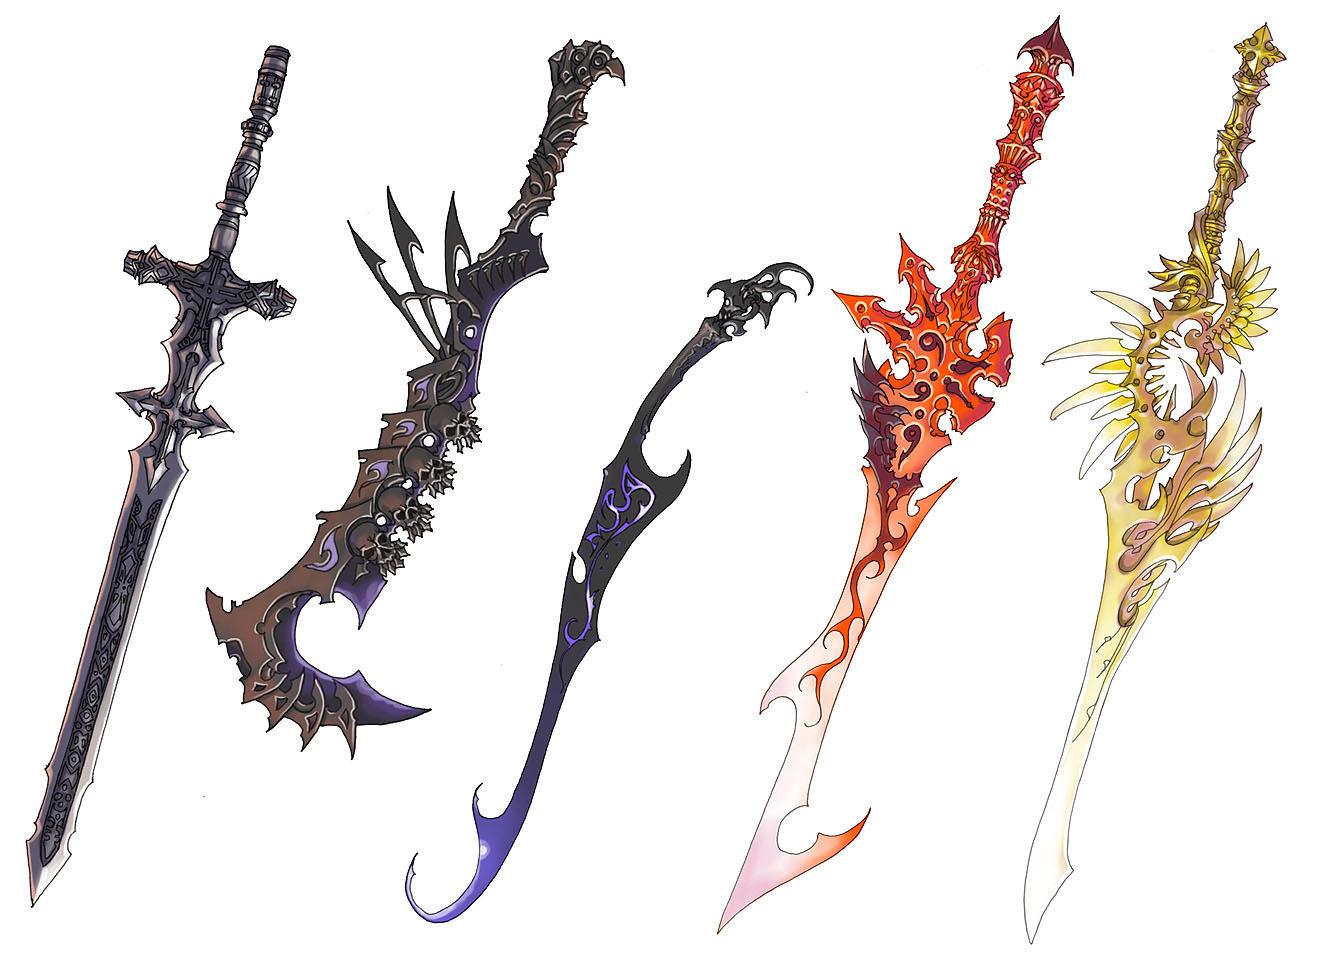 sword designs by Wen-M